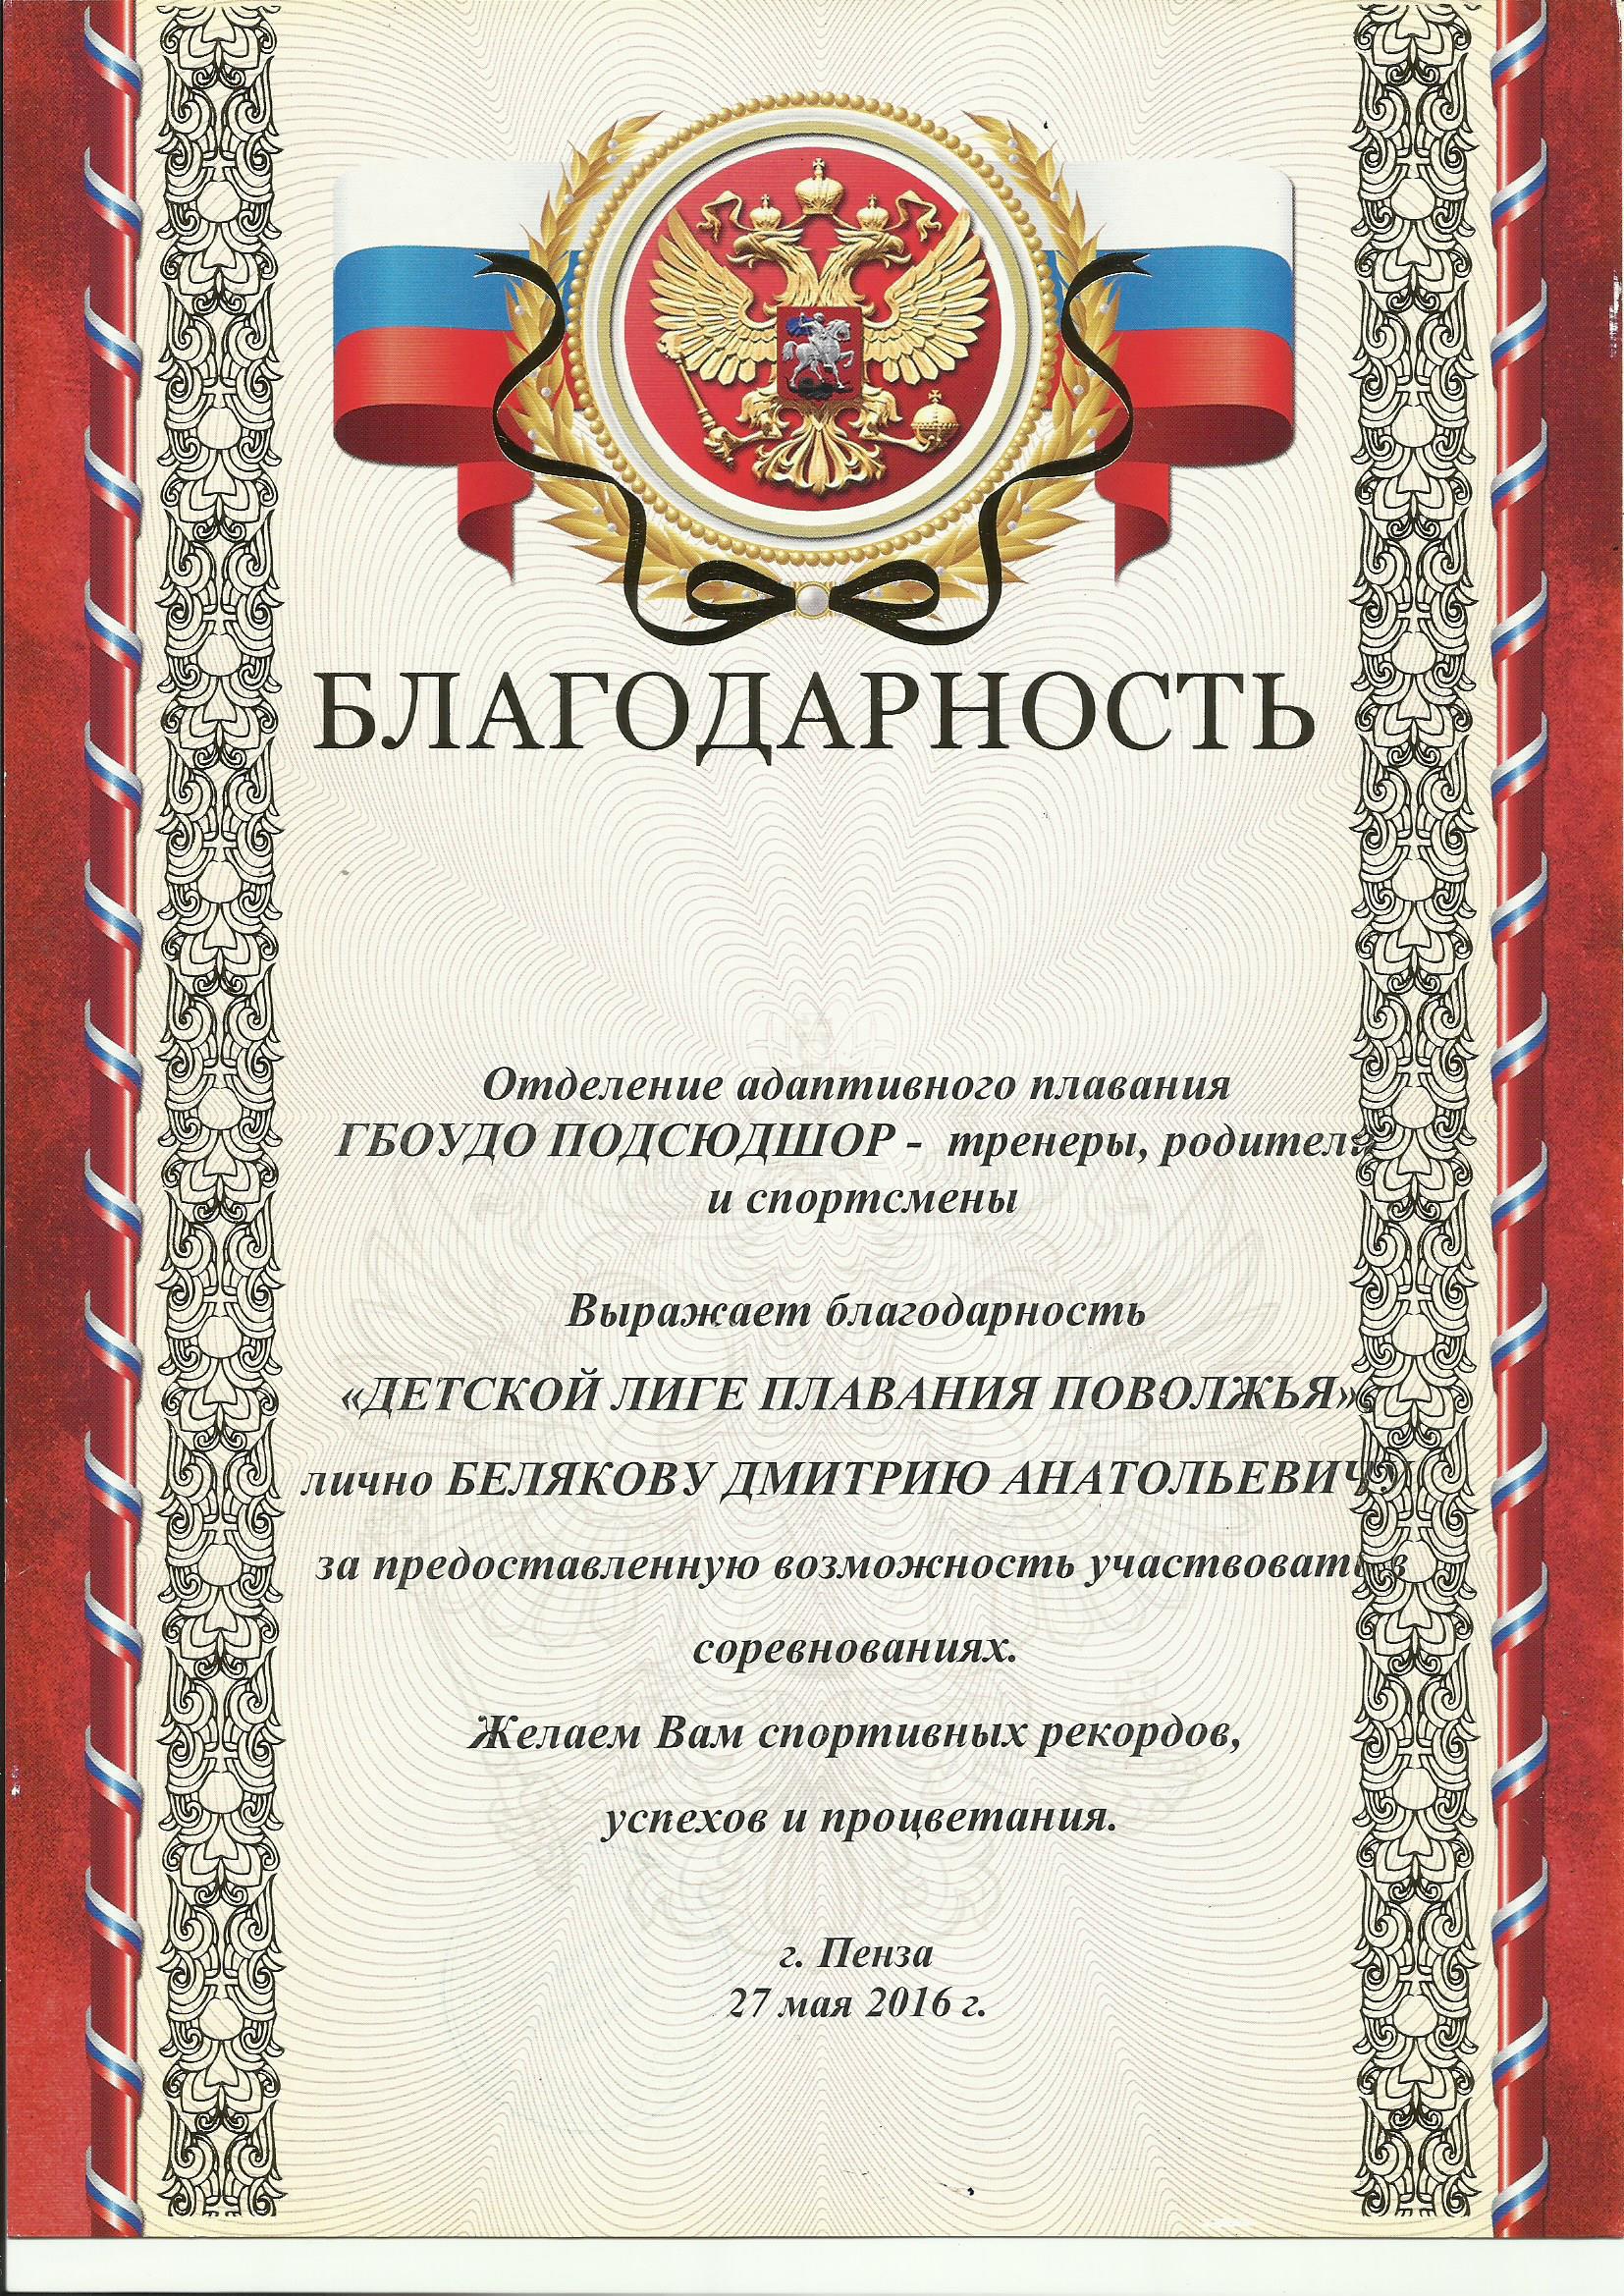 https://dlpp.ru/wp-content/uploads/2019/11/диплом-1-1.jpg